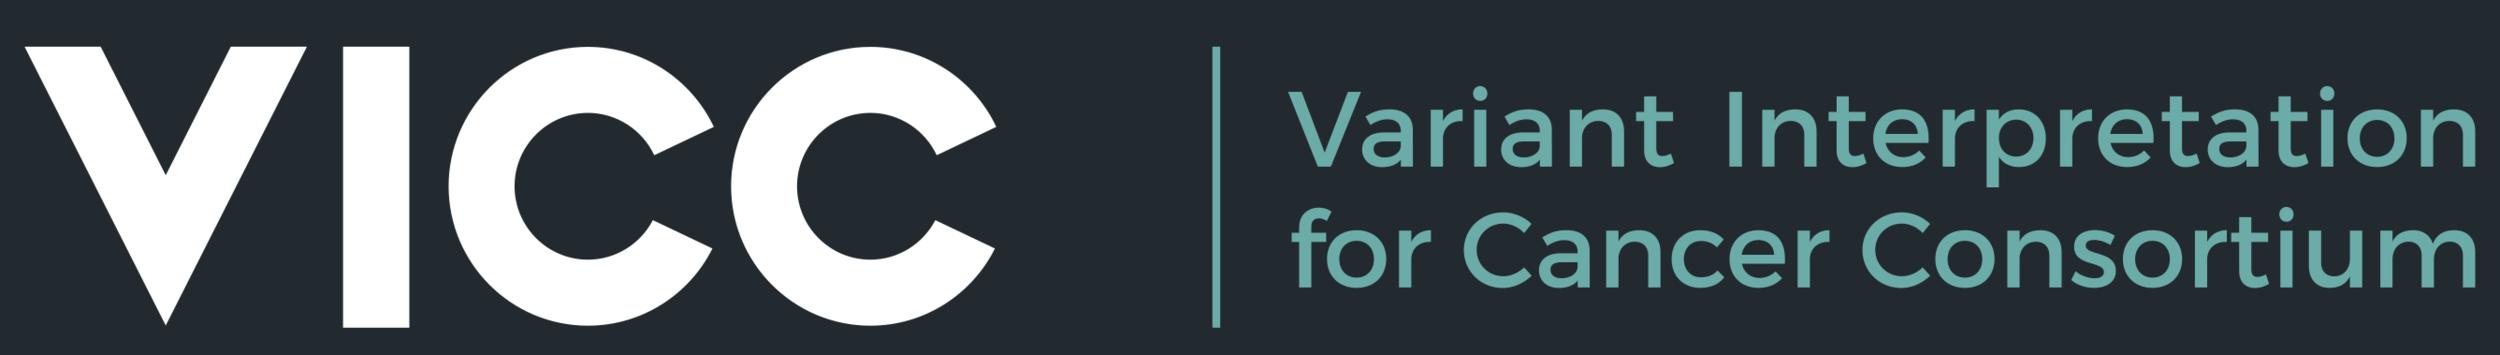 Variant Interpretation for Cancer Consortium VICC